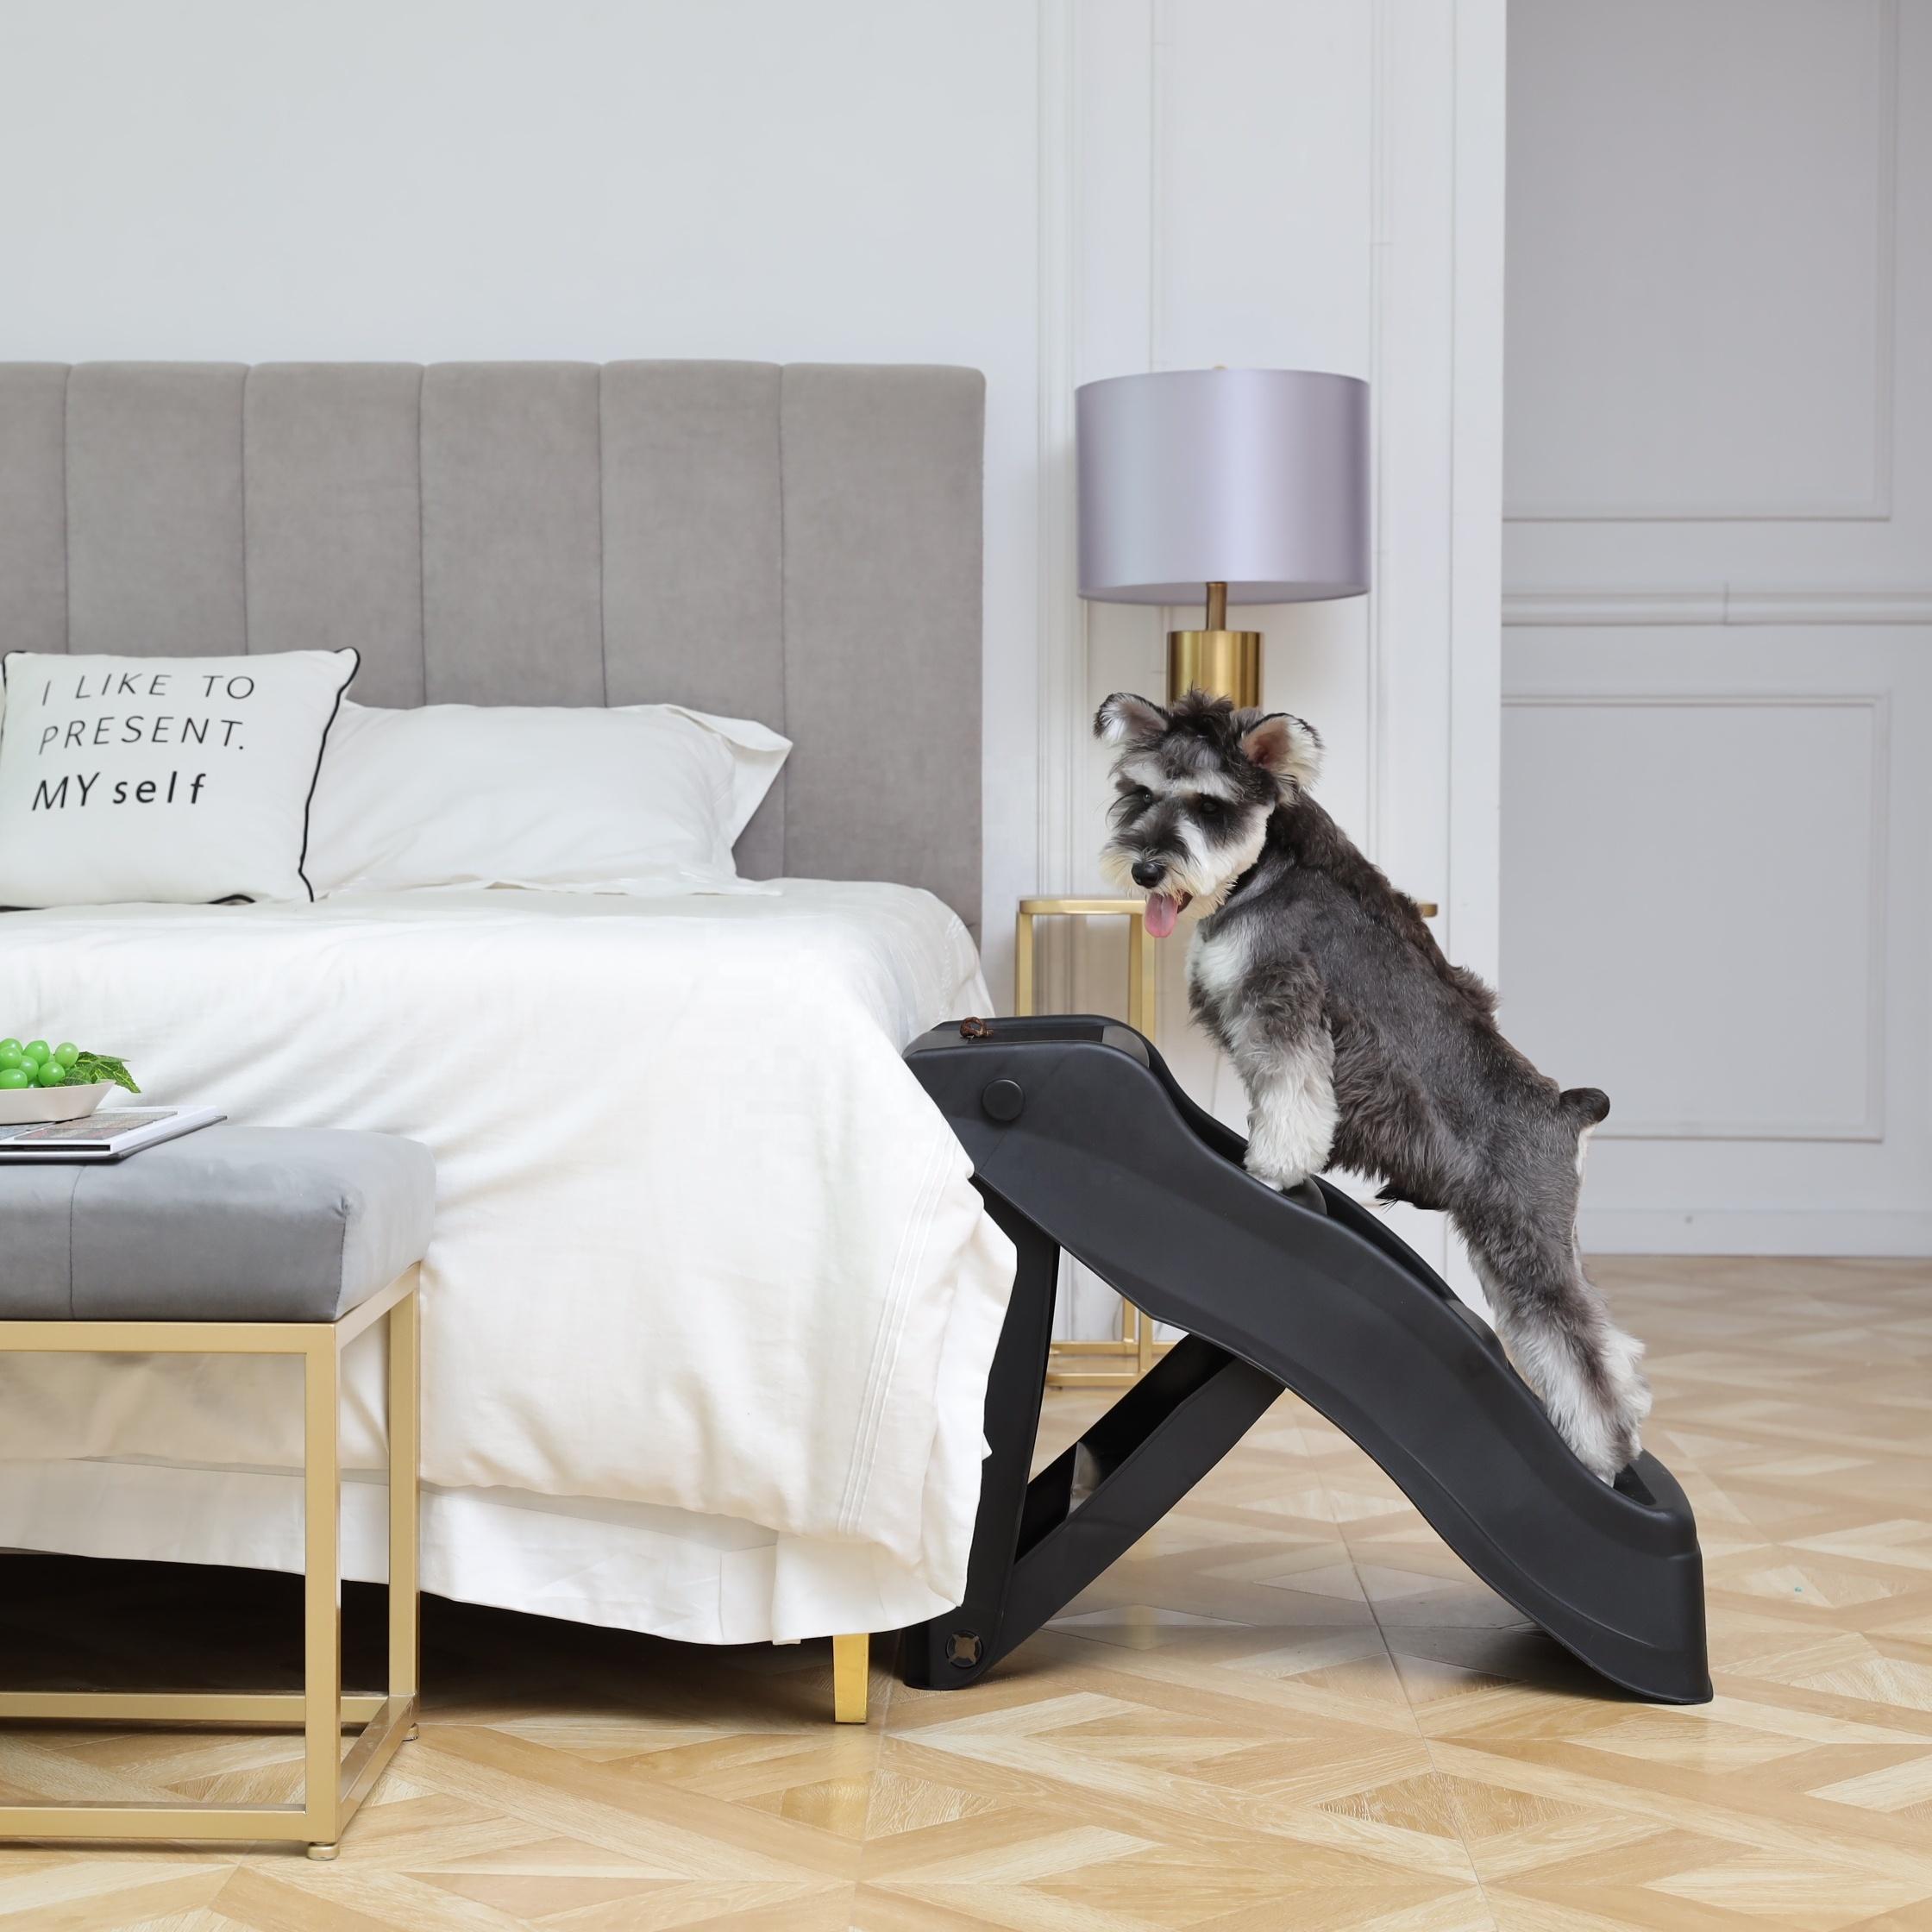 Pet Carrier Dog Ramp Folded D St4 Buy Folding Dog Ramp 4 Step Ramp Plastic Ramp Product On Alibaba Com